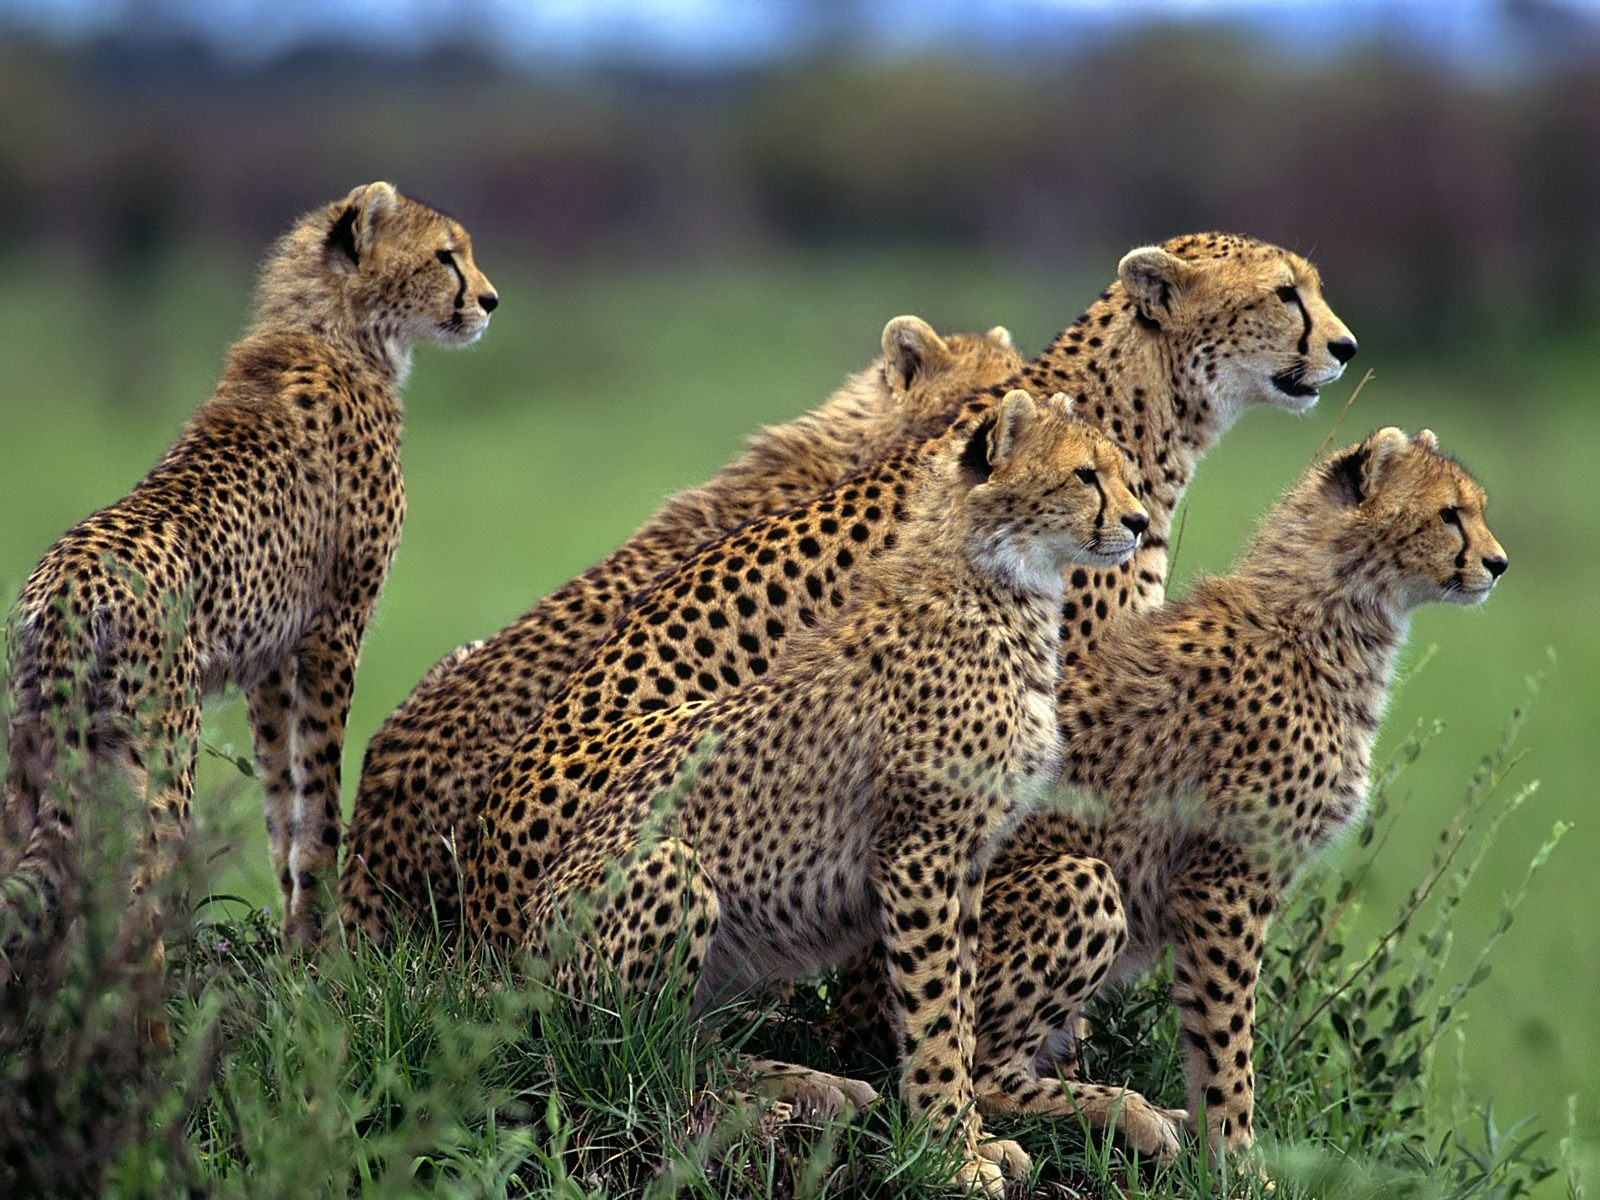 Animated Cheetah Wallpaper anticipation wallpaper cheetahs animals wallpapers in jpg